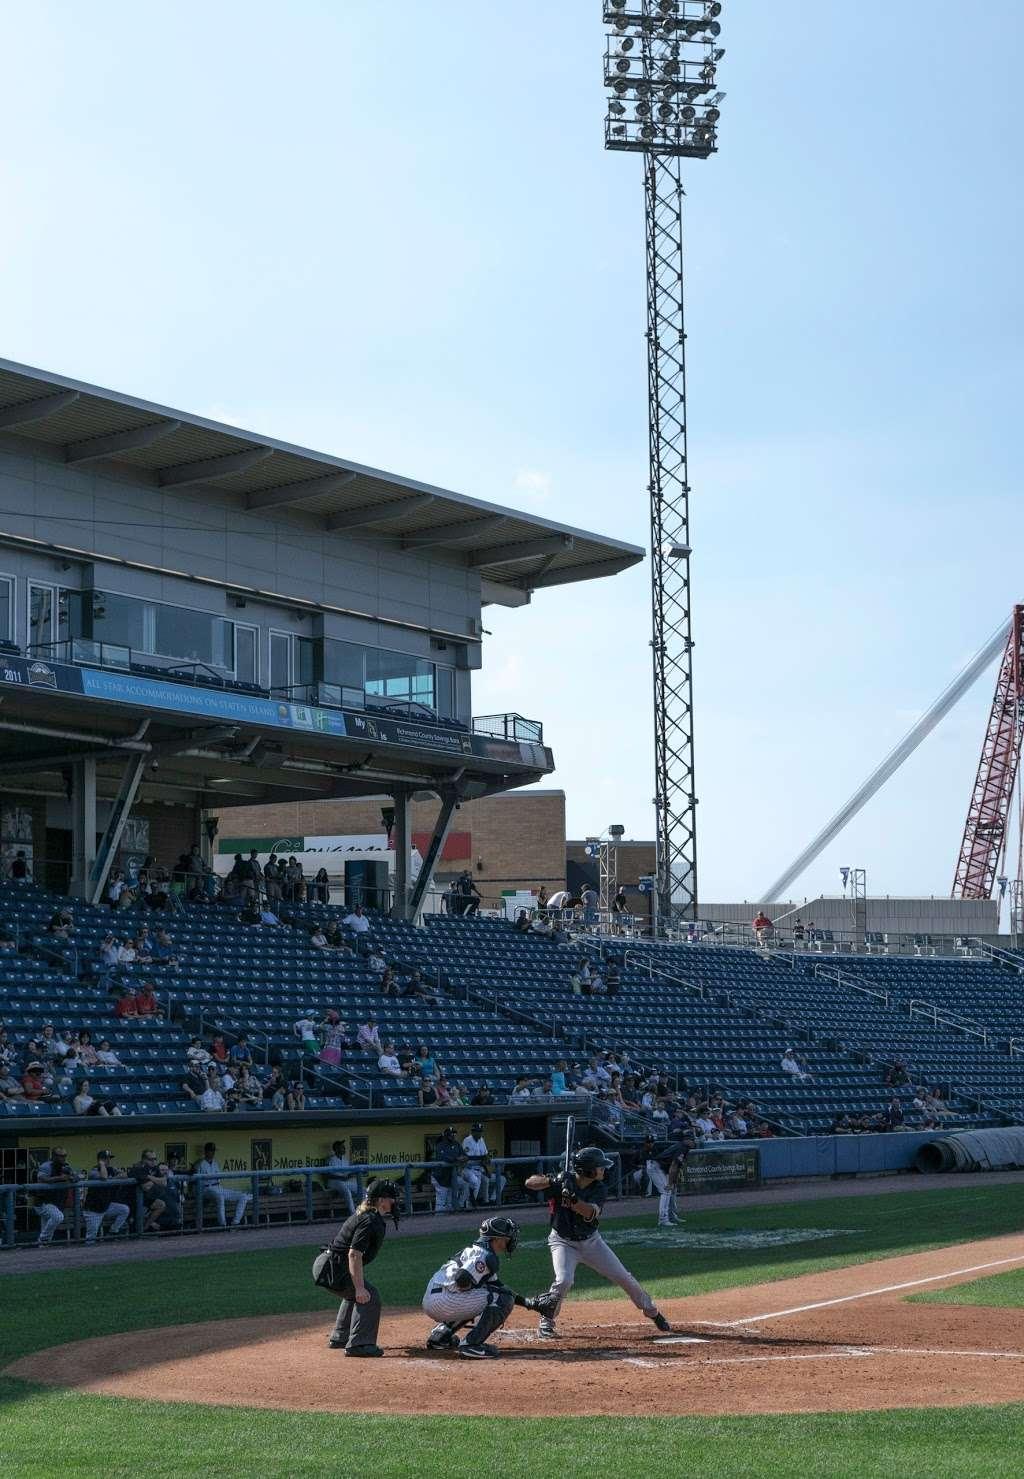 Richmond County Bank Ballpark - stadium  | Photo 3 of 9 | Address: 75 Richmond Terrace, Staten Island, NY 10301, USA | Phone: (718) 720-9265